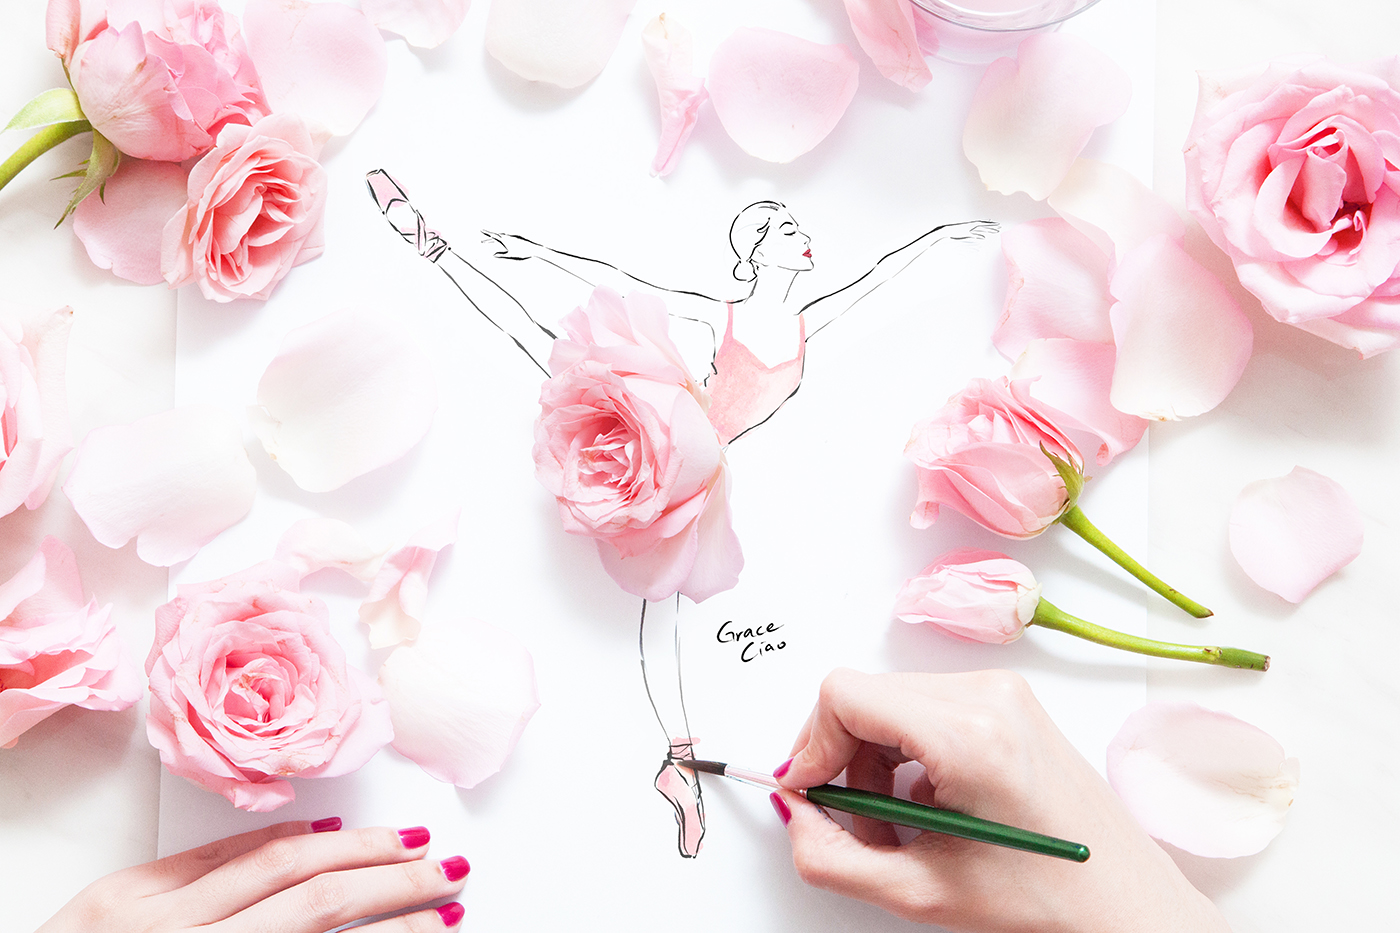 Drawn ballerine flower Grace Grace Ciao Ciao Illustrator